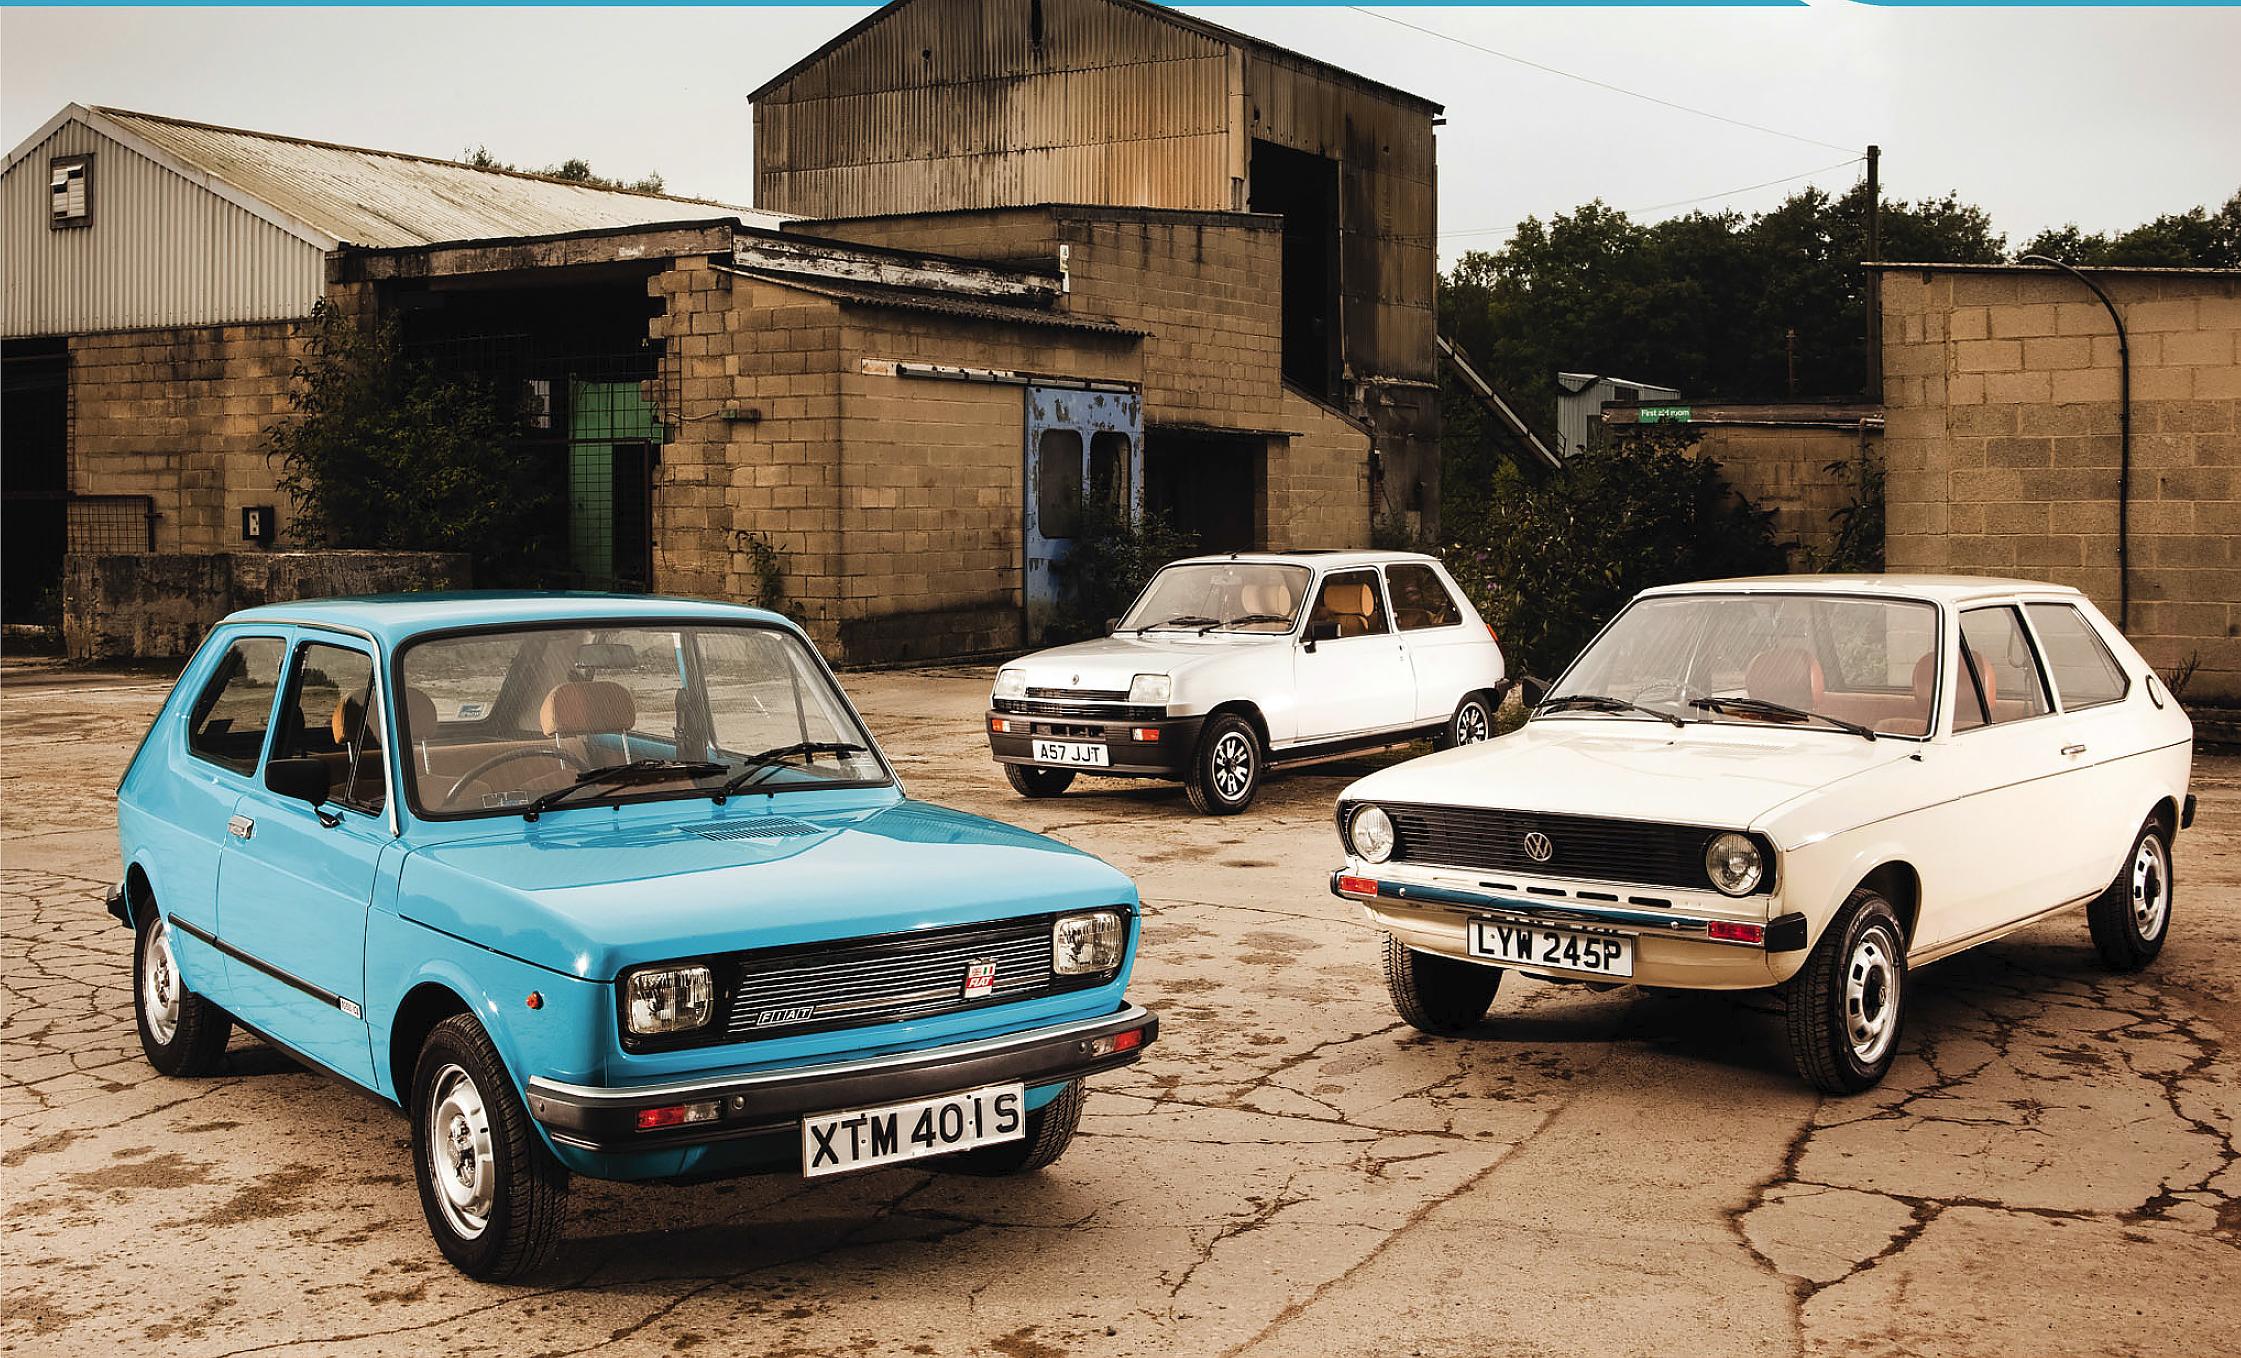 Renault 5 TX vs Fiat 127 TL and Volkswagen Polo L